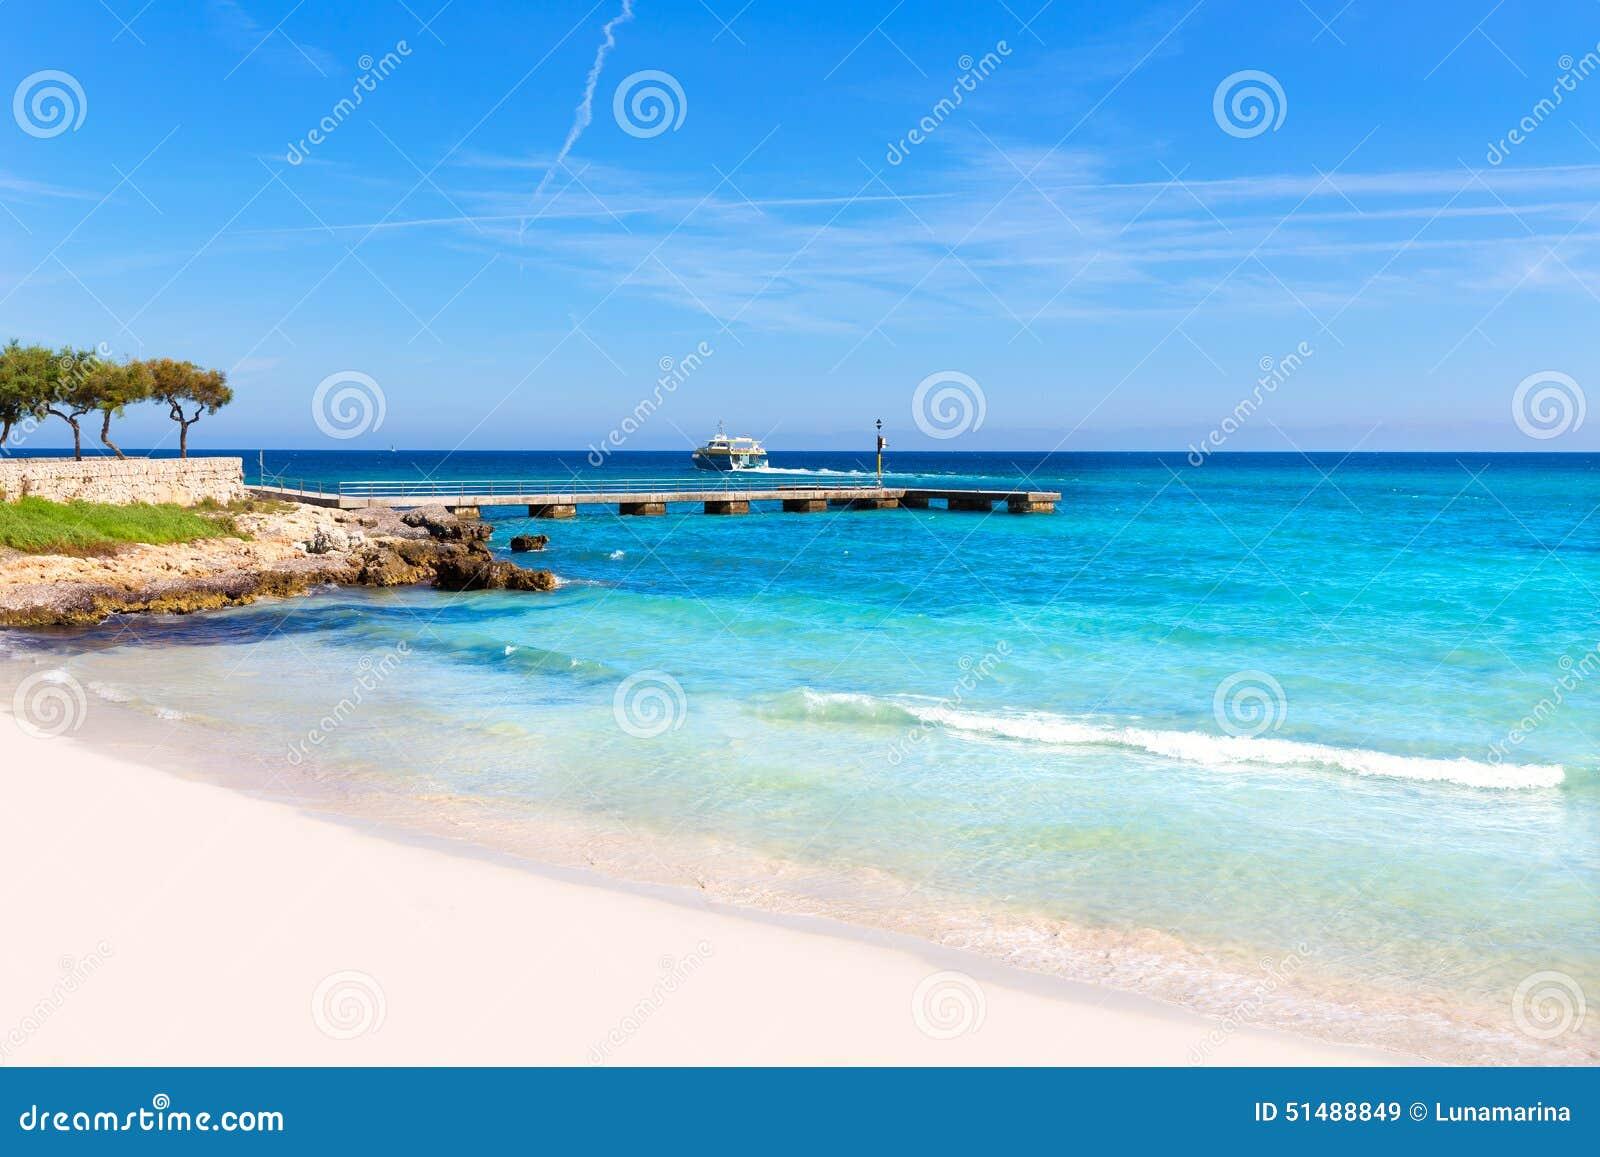 majorca cala millor beach son servera mallorca stock photo image 51488849. Black Bedroom Furniture Sets. Home Design Ideas